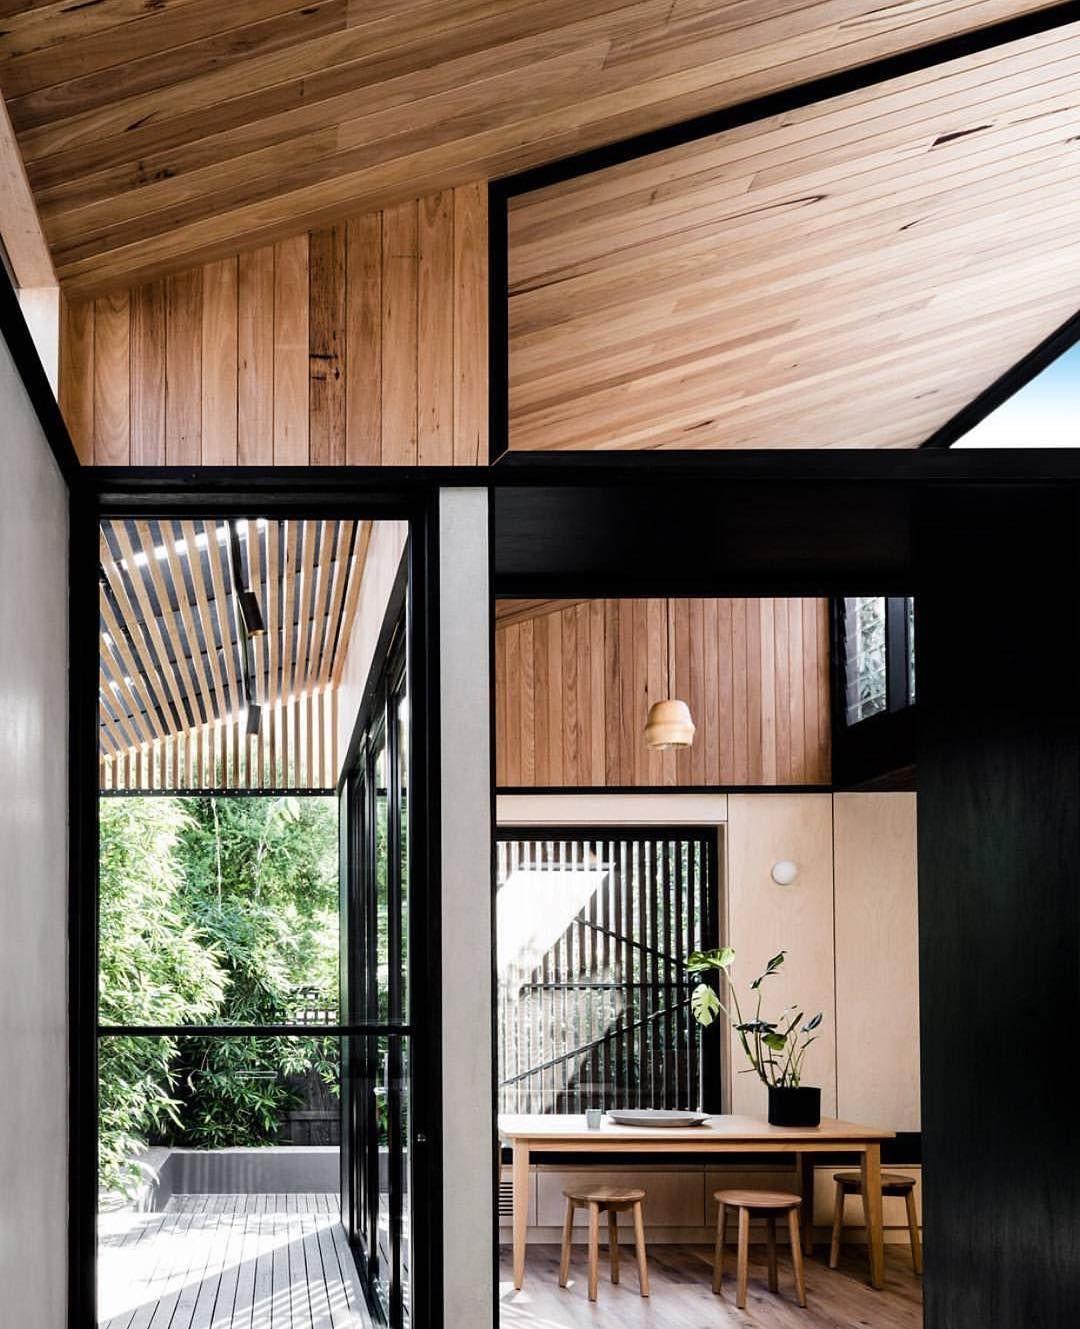 Willow Urban Retreat Minimalist Interior Design Minimalist Interior